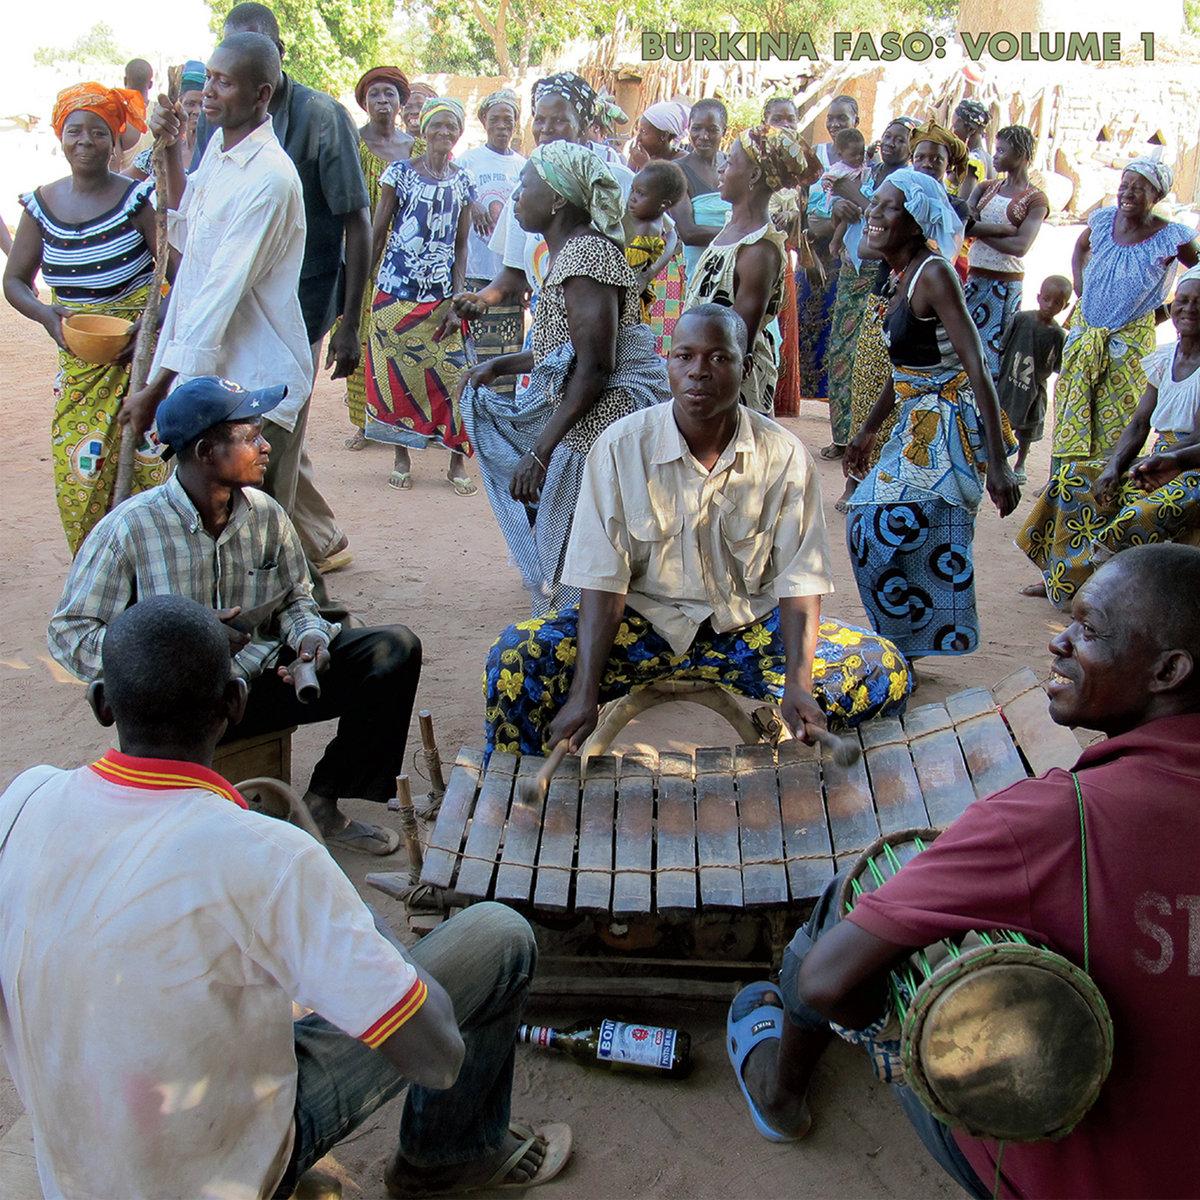 Burkino Faso - the birthplace of honest people